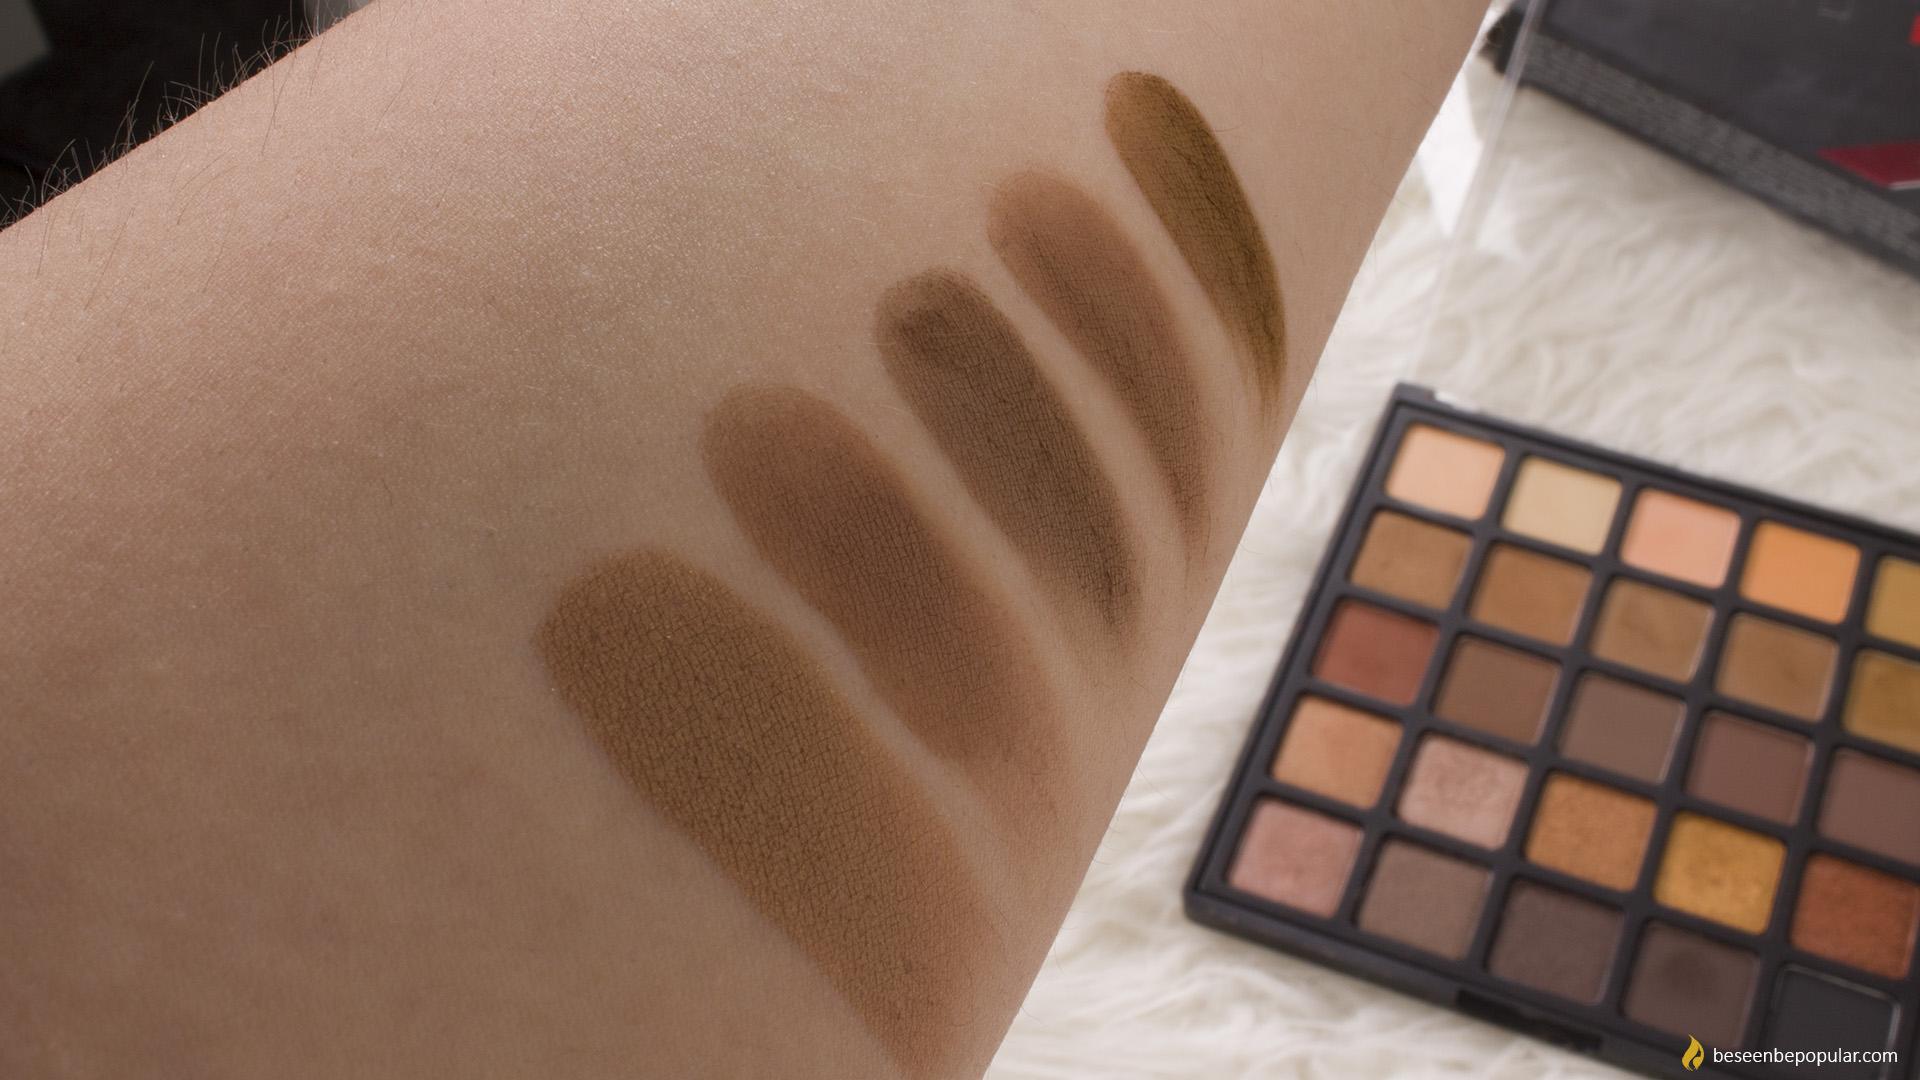 Morphe Copper Spice eyeshadow palette